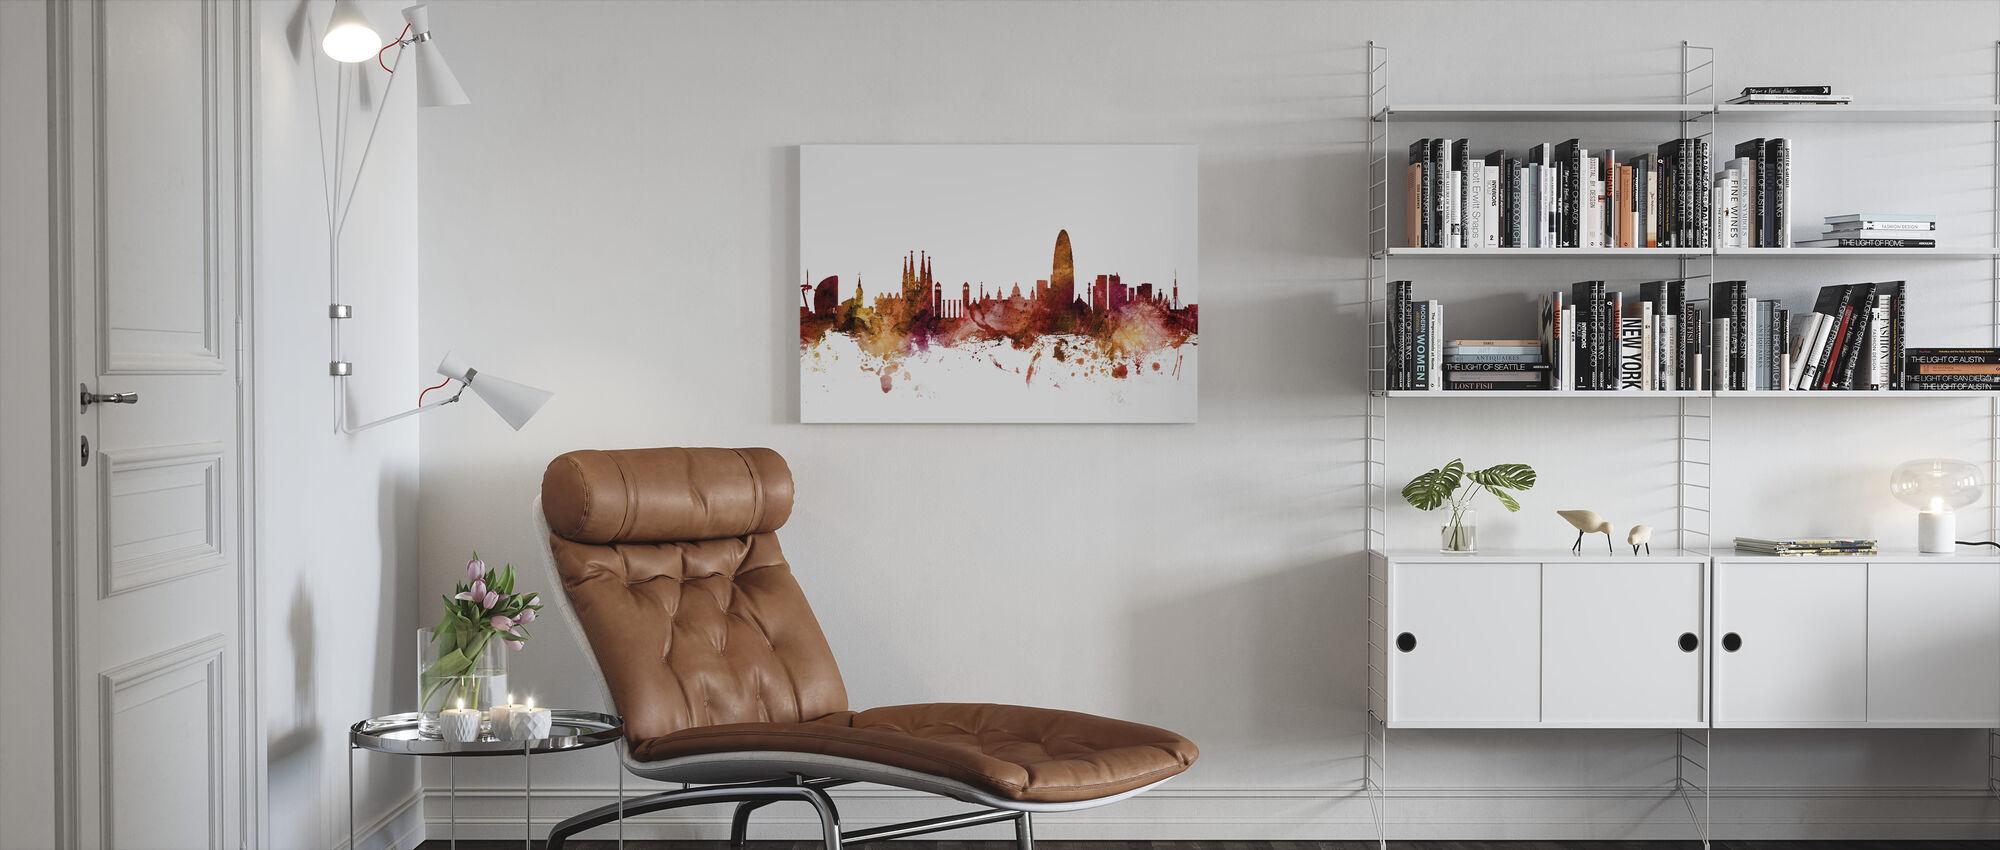 Barcelona Spain Skyline - Canvas print - Living Room